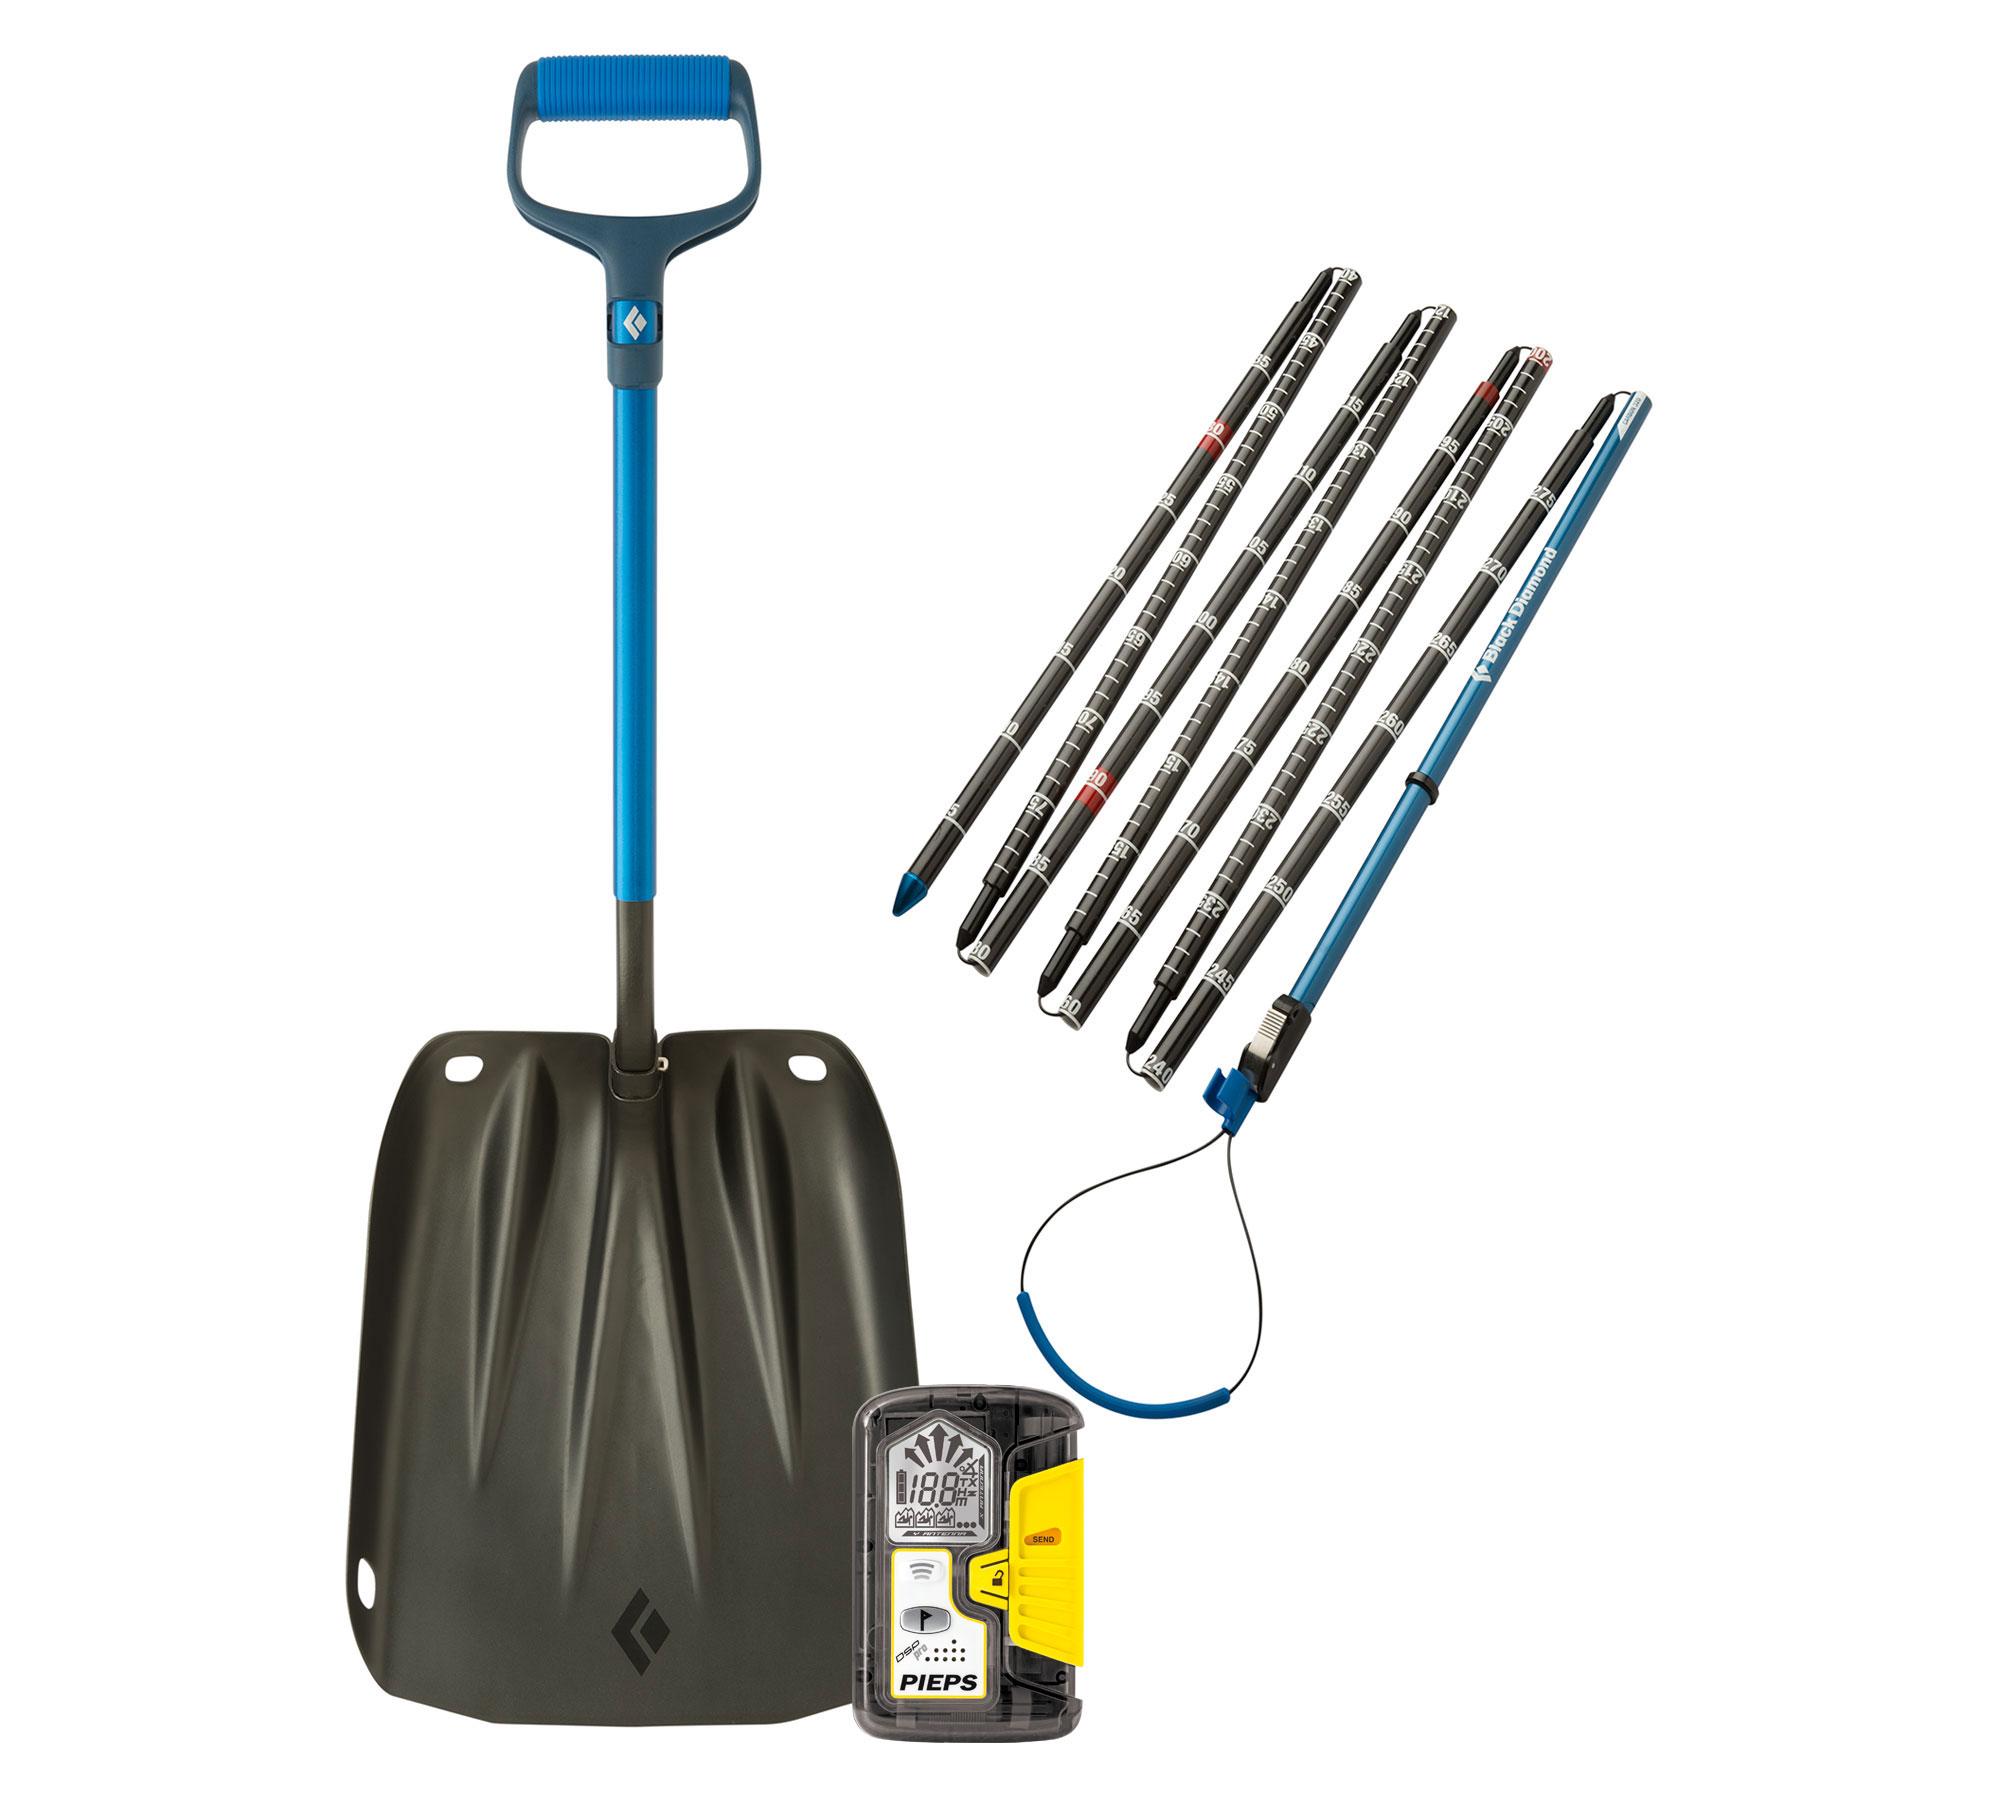 beacon, shovel, and probe